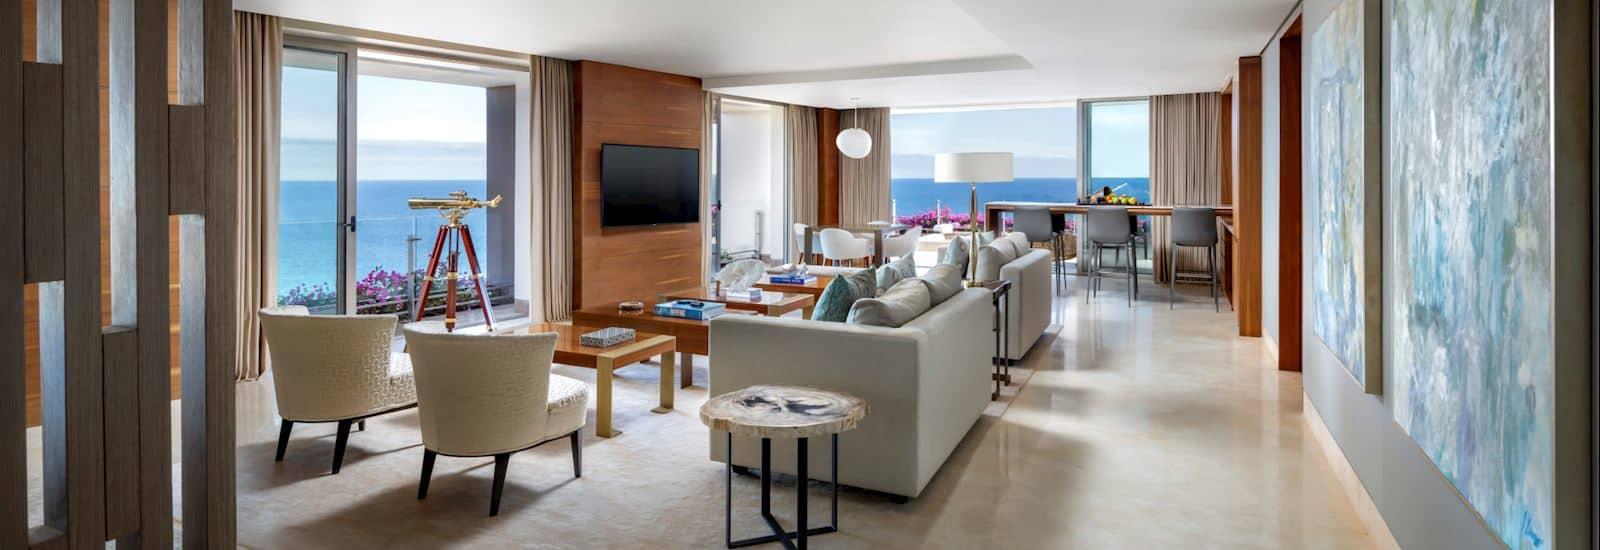 Royal Suite Ocean Front View at Grand Velas Los Cabos